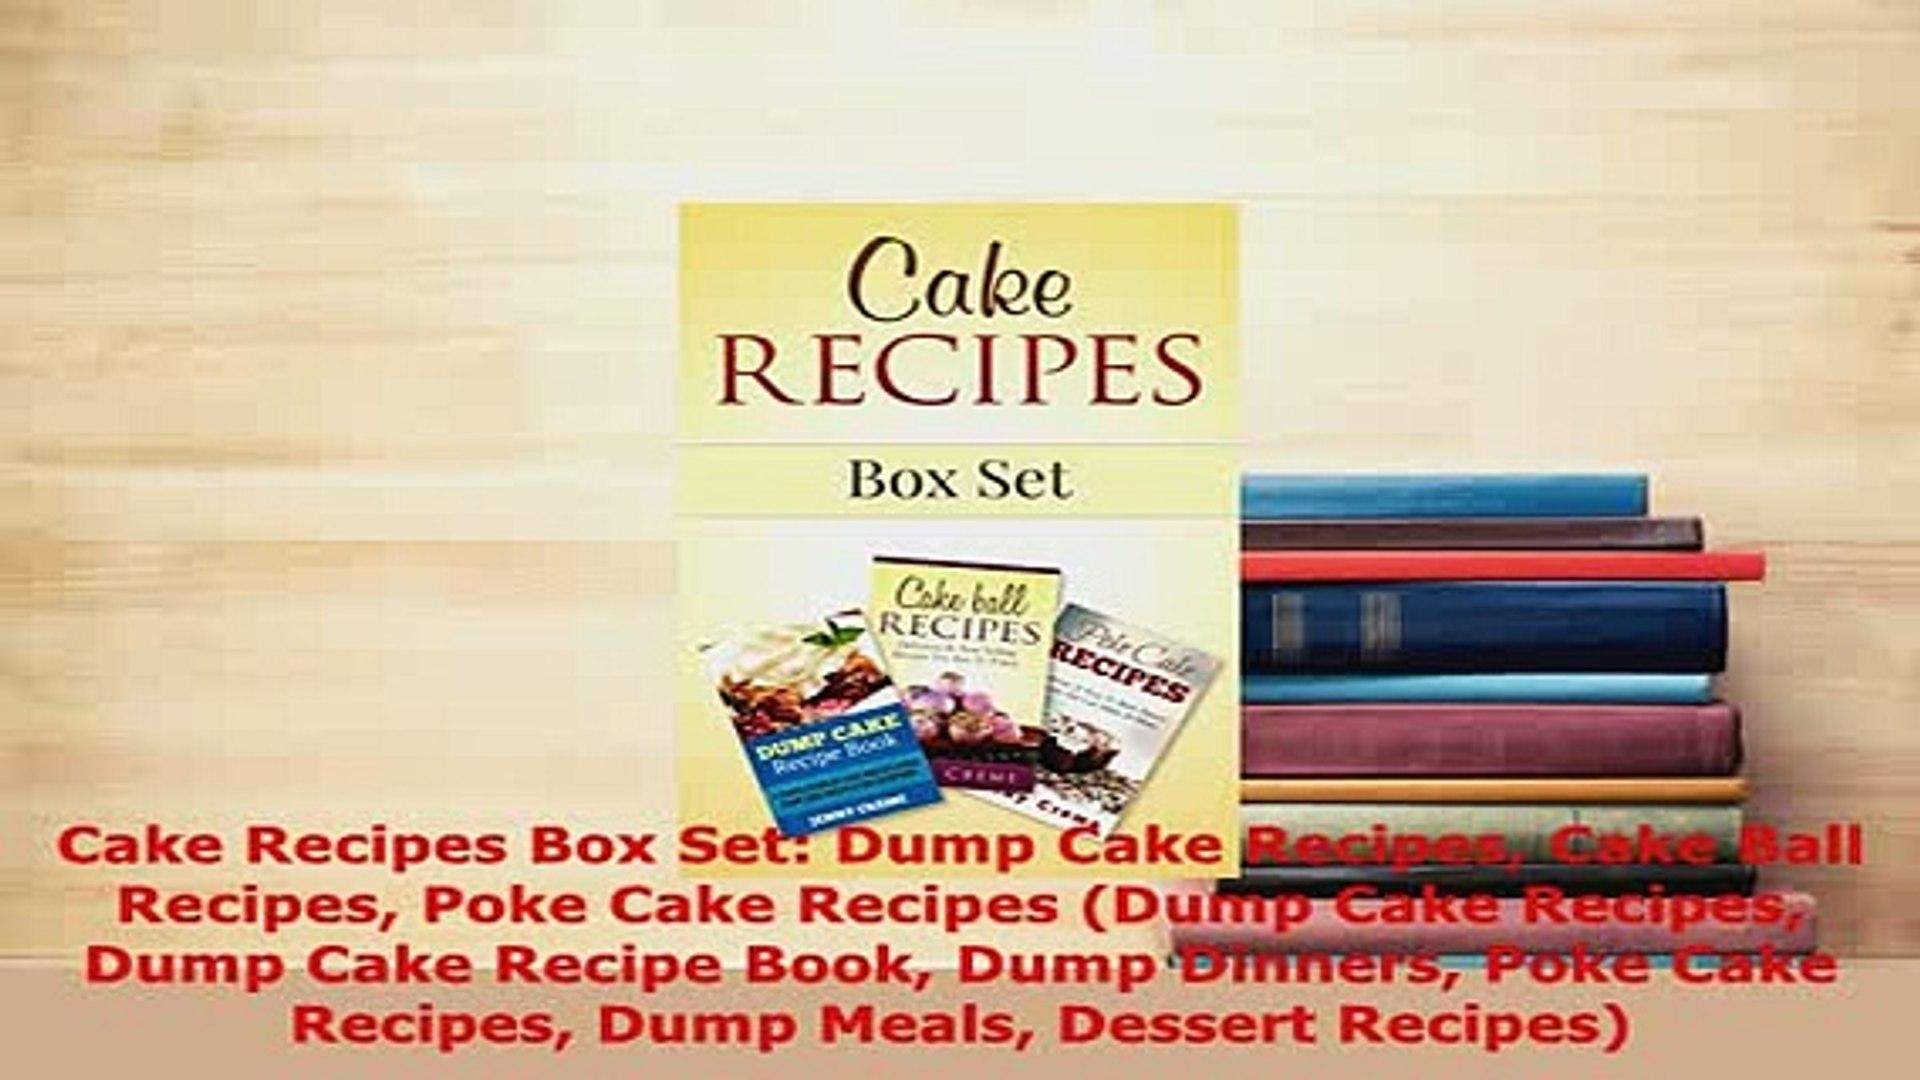 Download  Cake Recipes Box Set Dump Cake Recipes Cake Ball Recipes Poke Cake Recipes Dump Cake Read